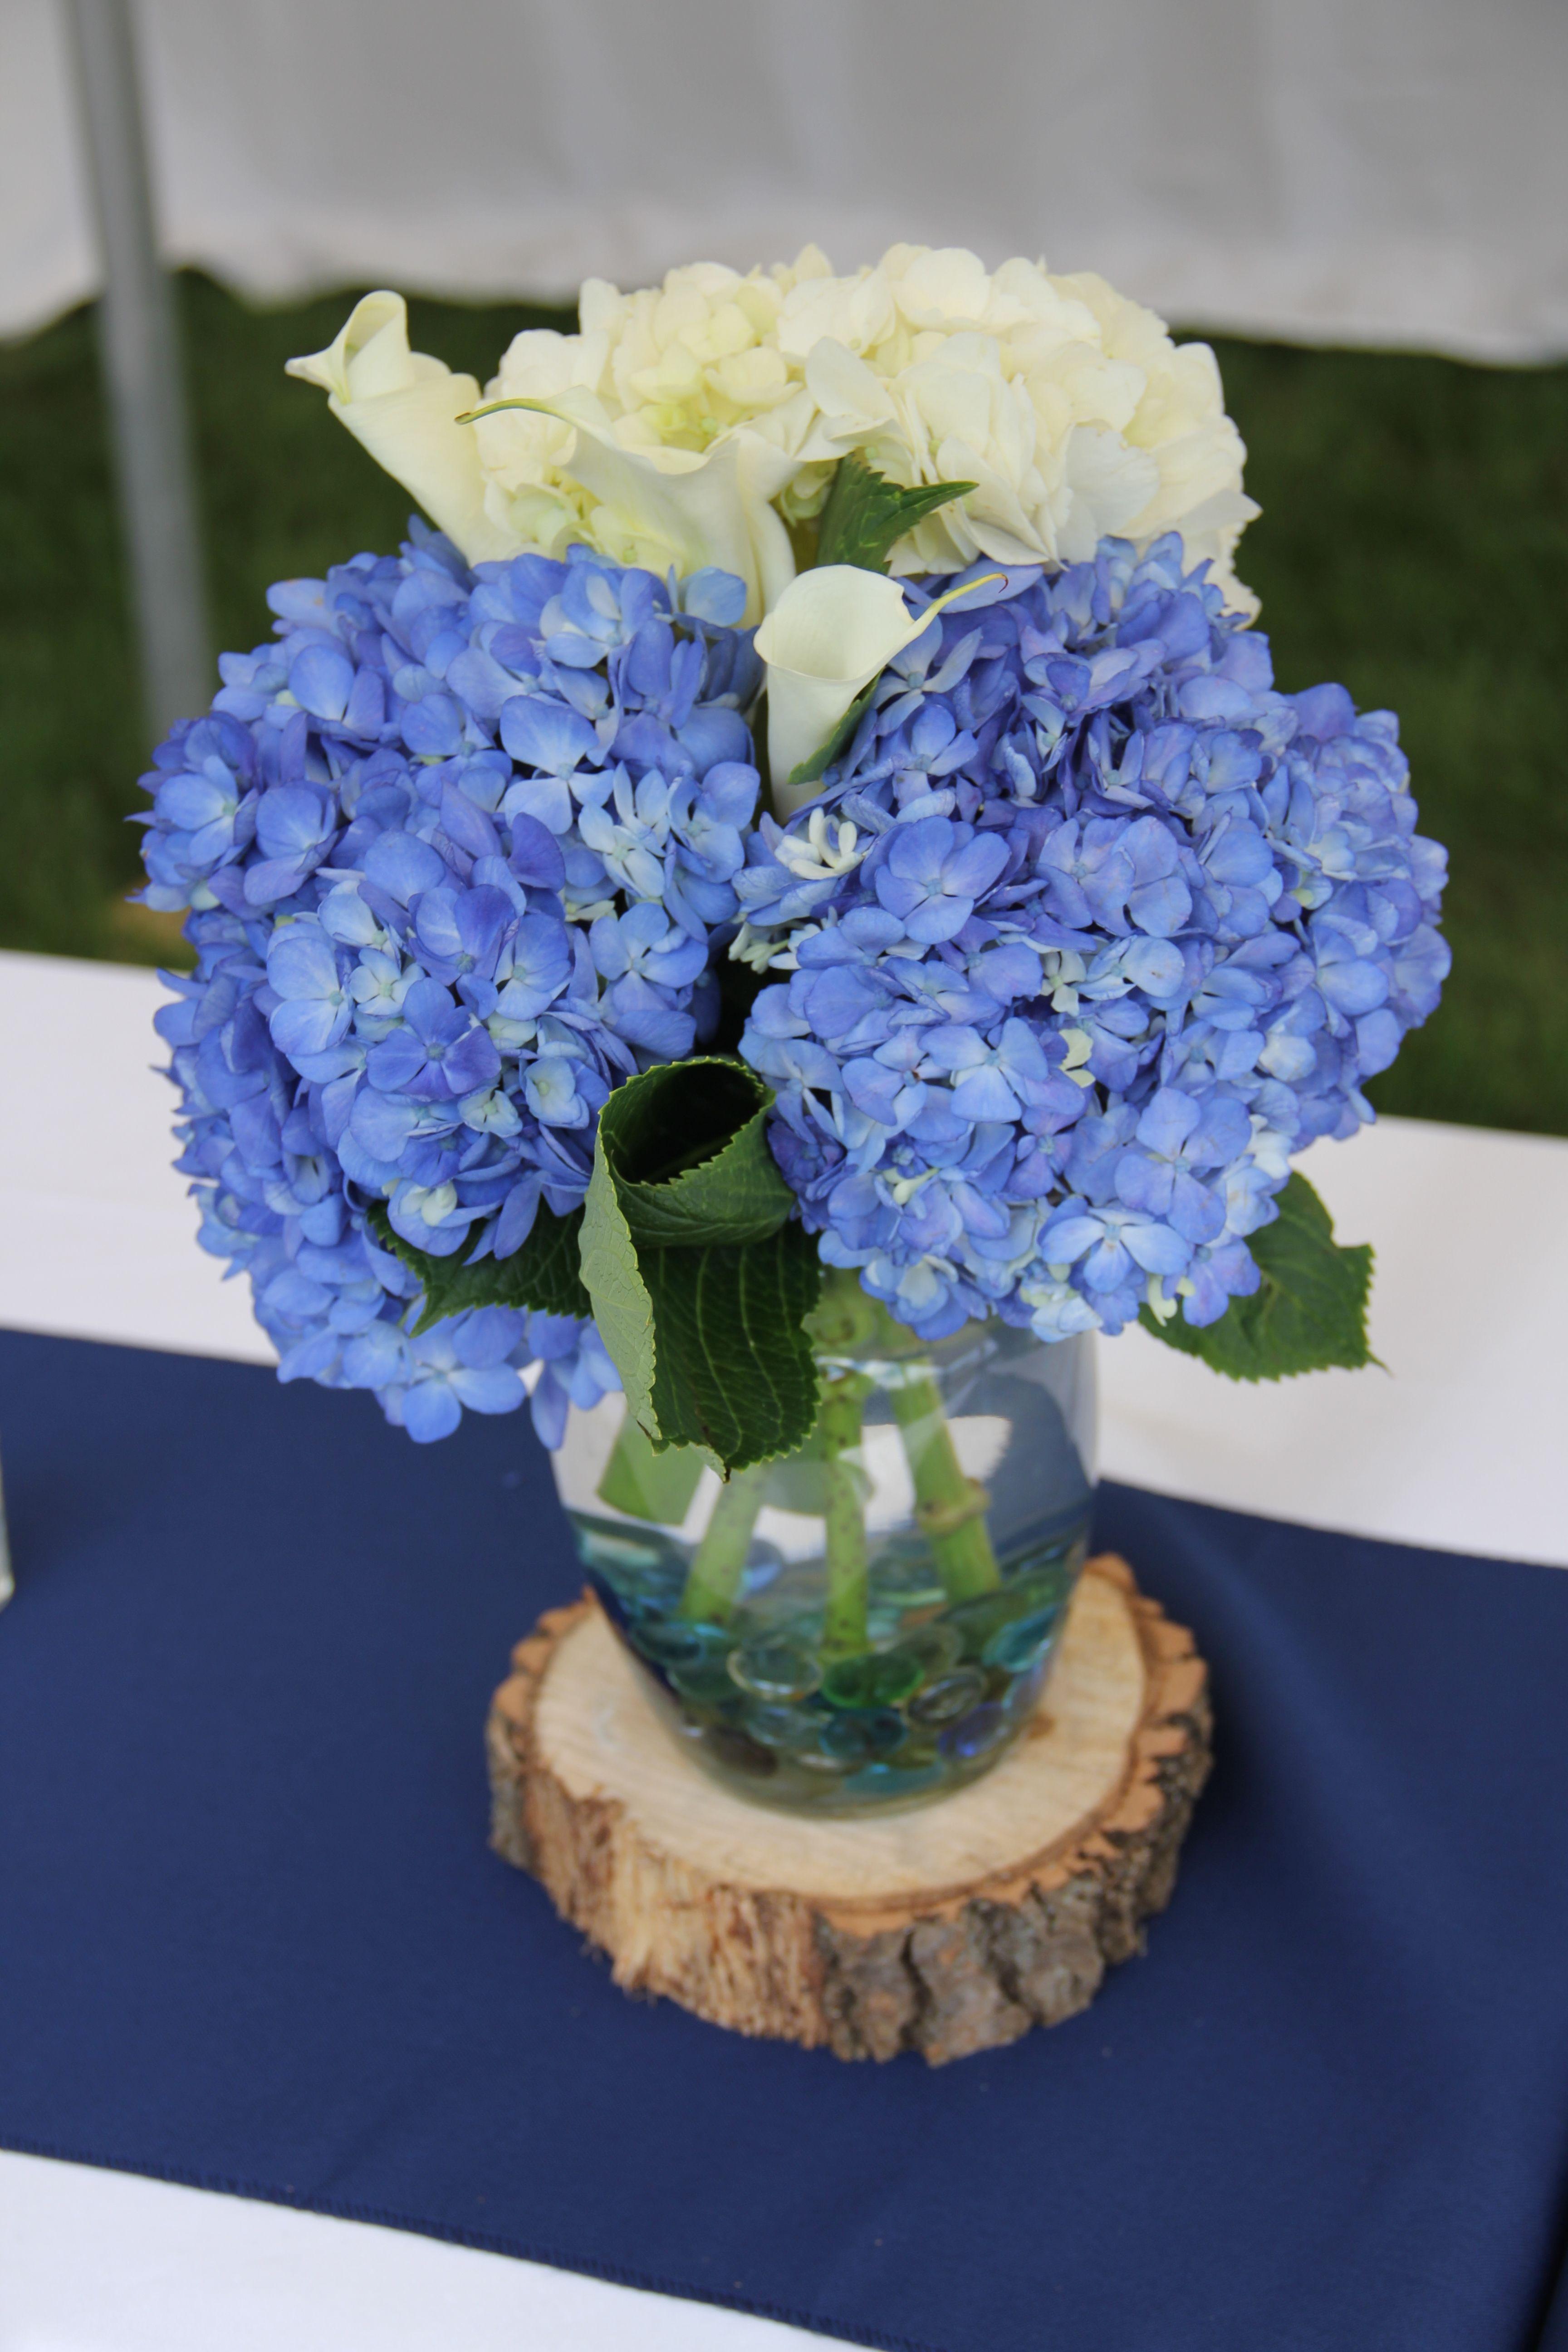 White and shocking blue hydrangeas from costco backyard